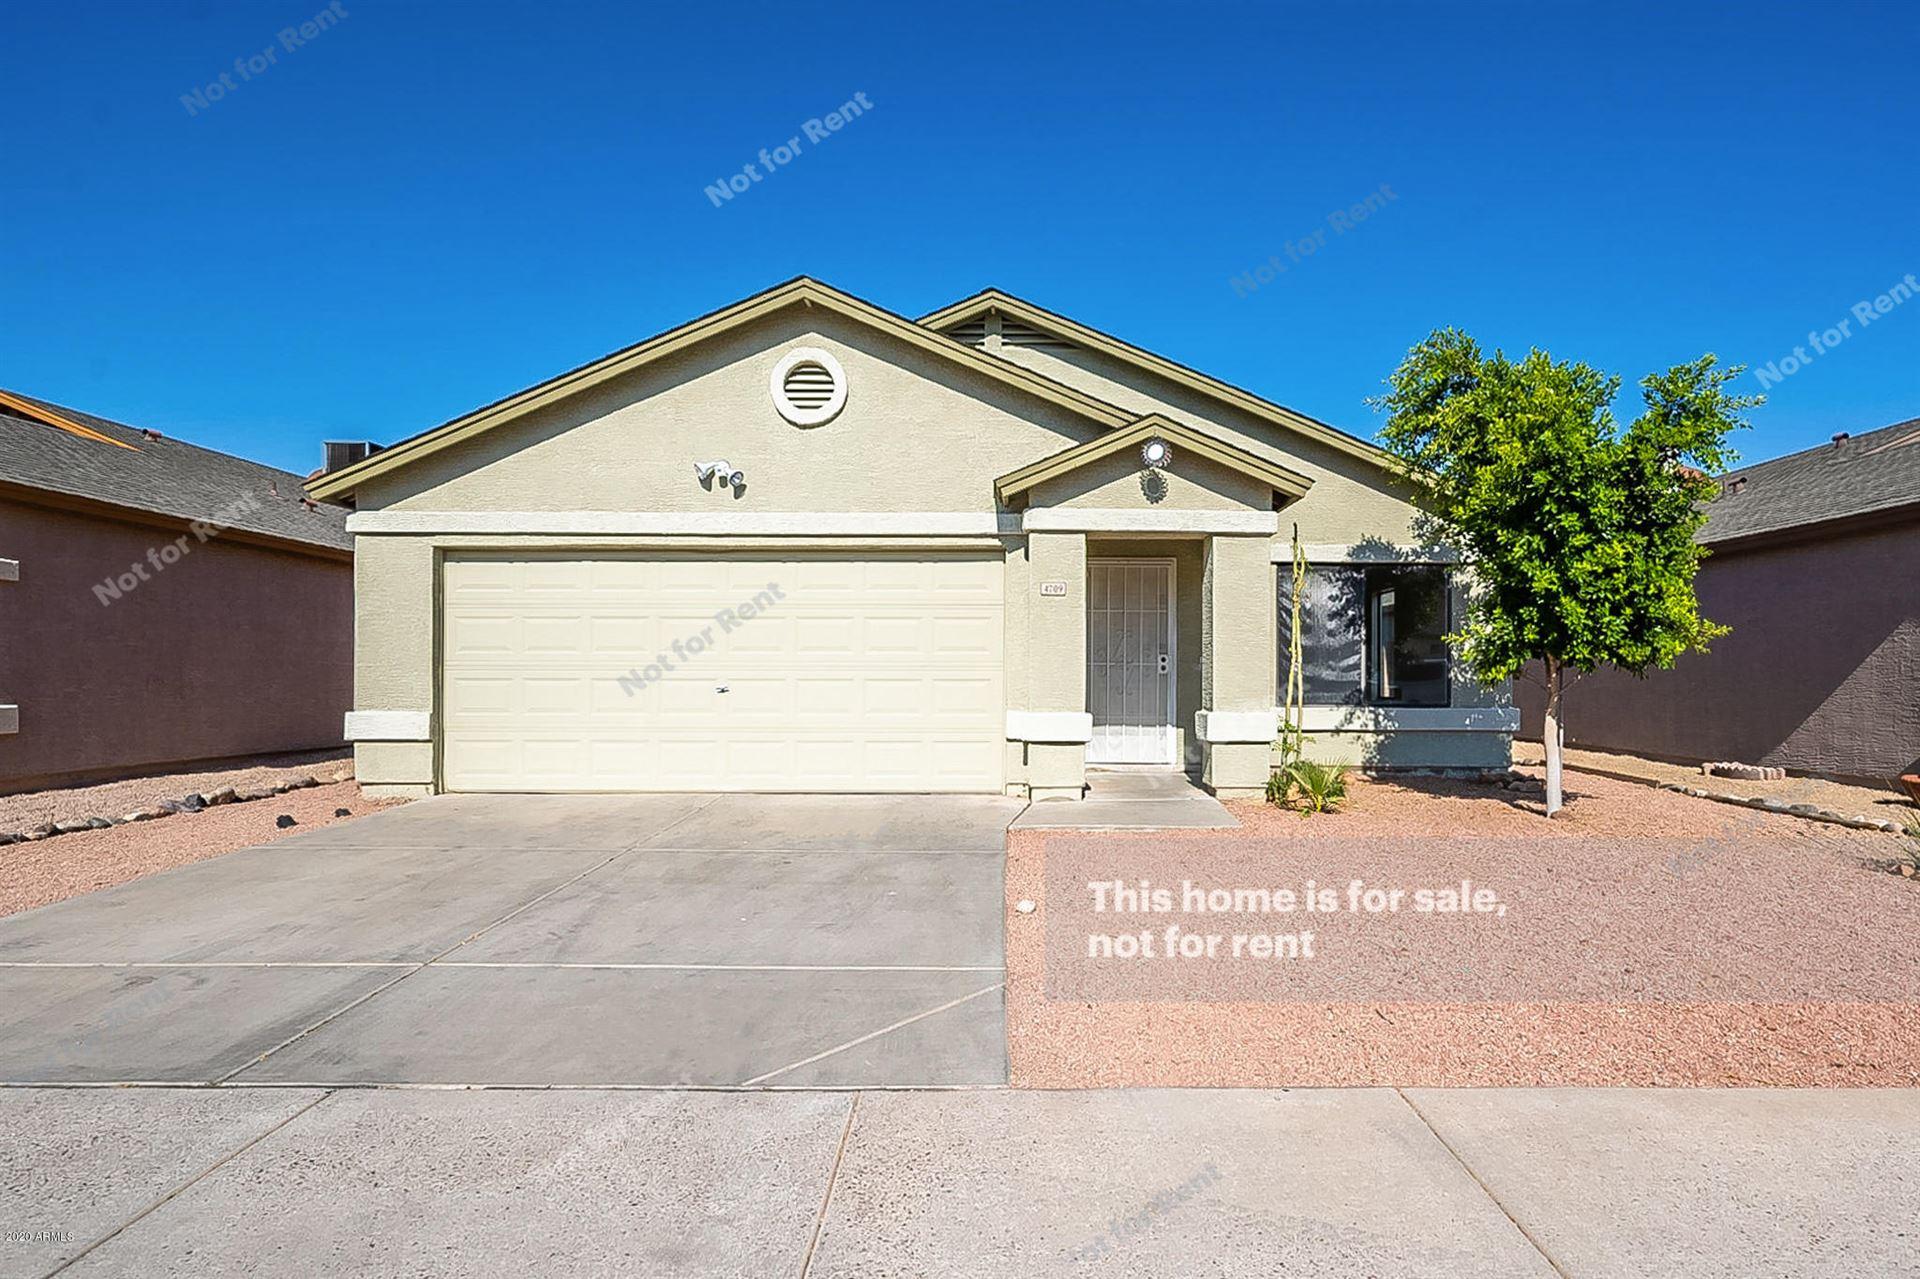 4709 N 85TH Avenue, Phoenix, AZ 85037 - MLS#: 6086494